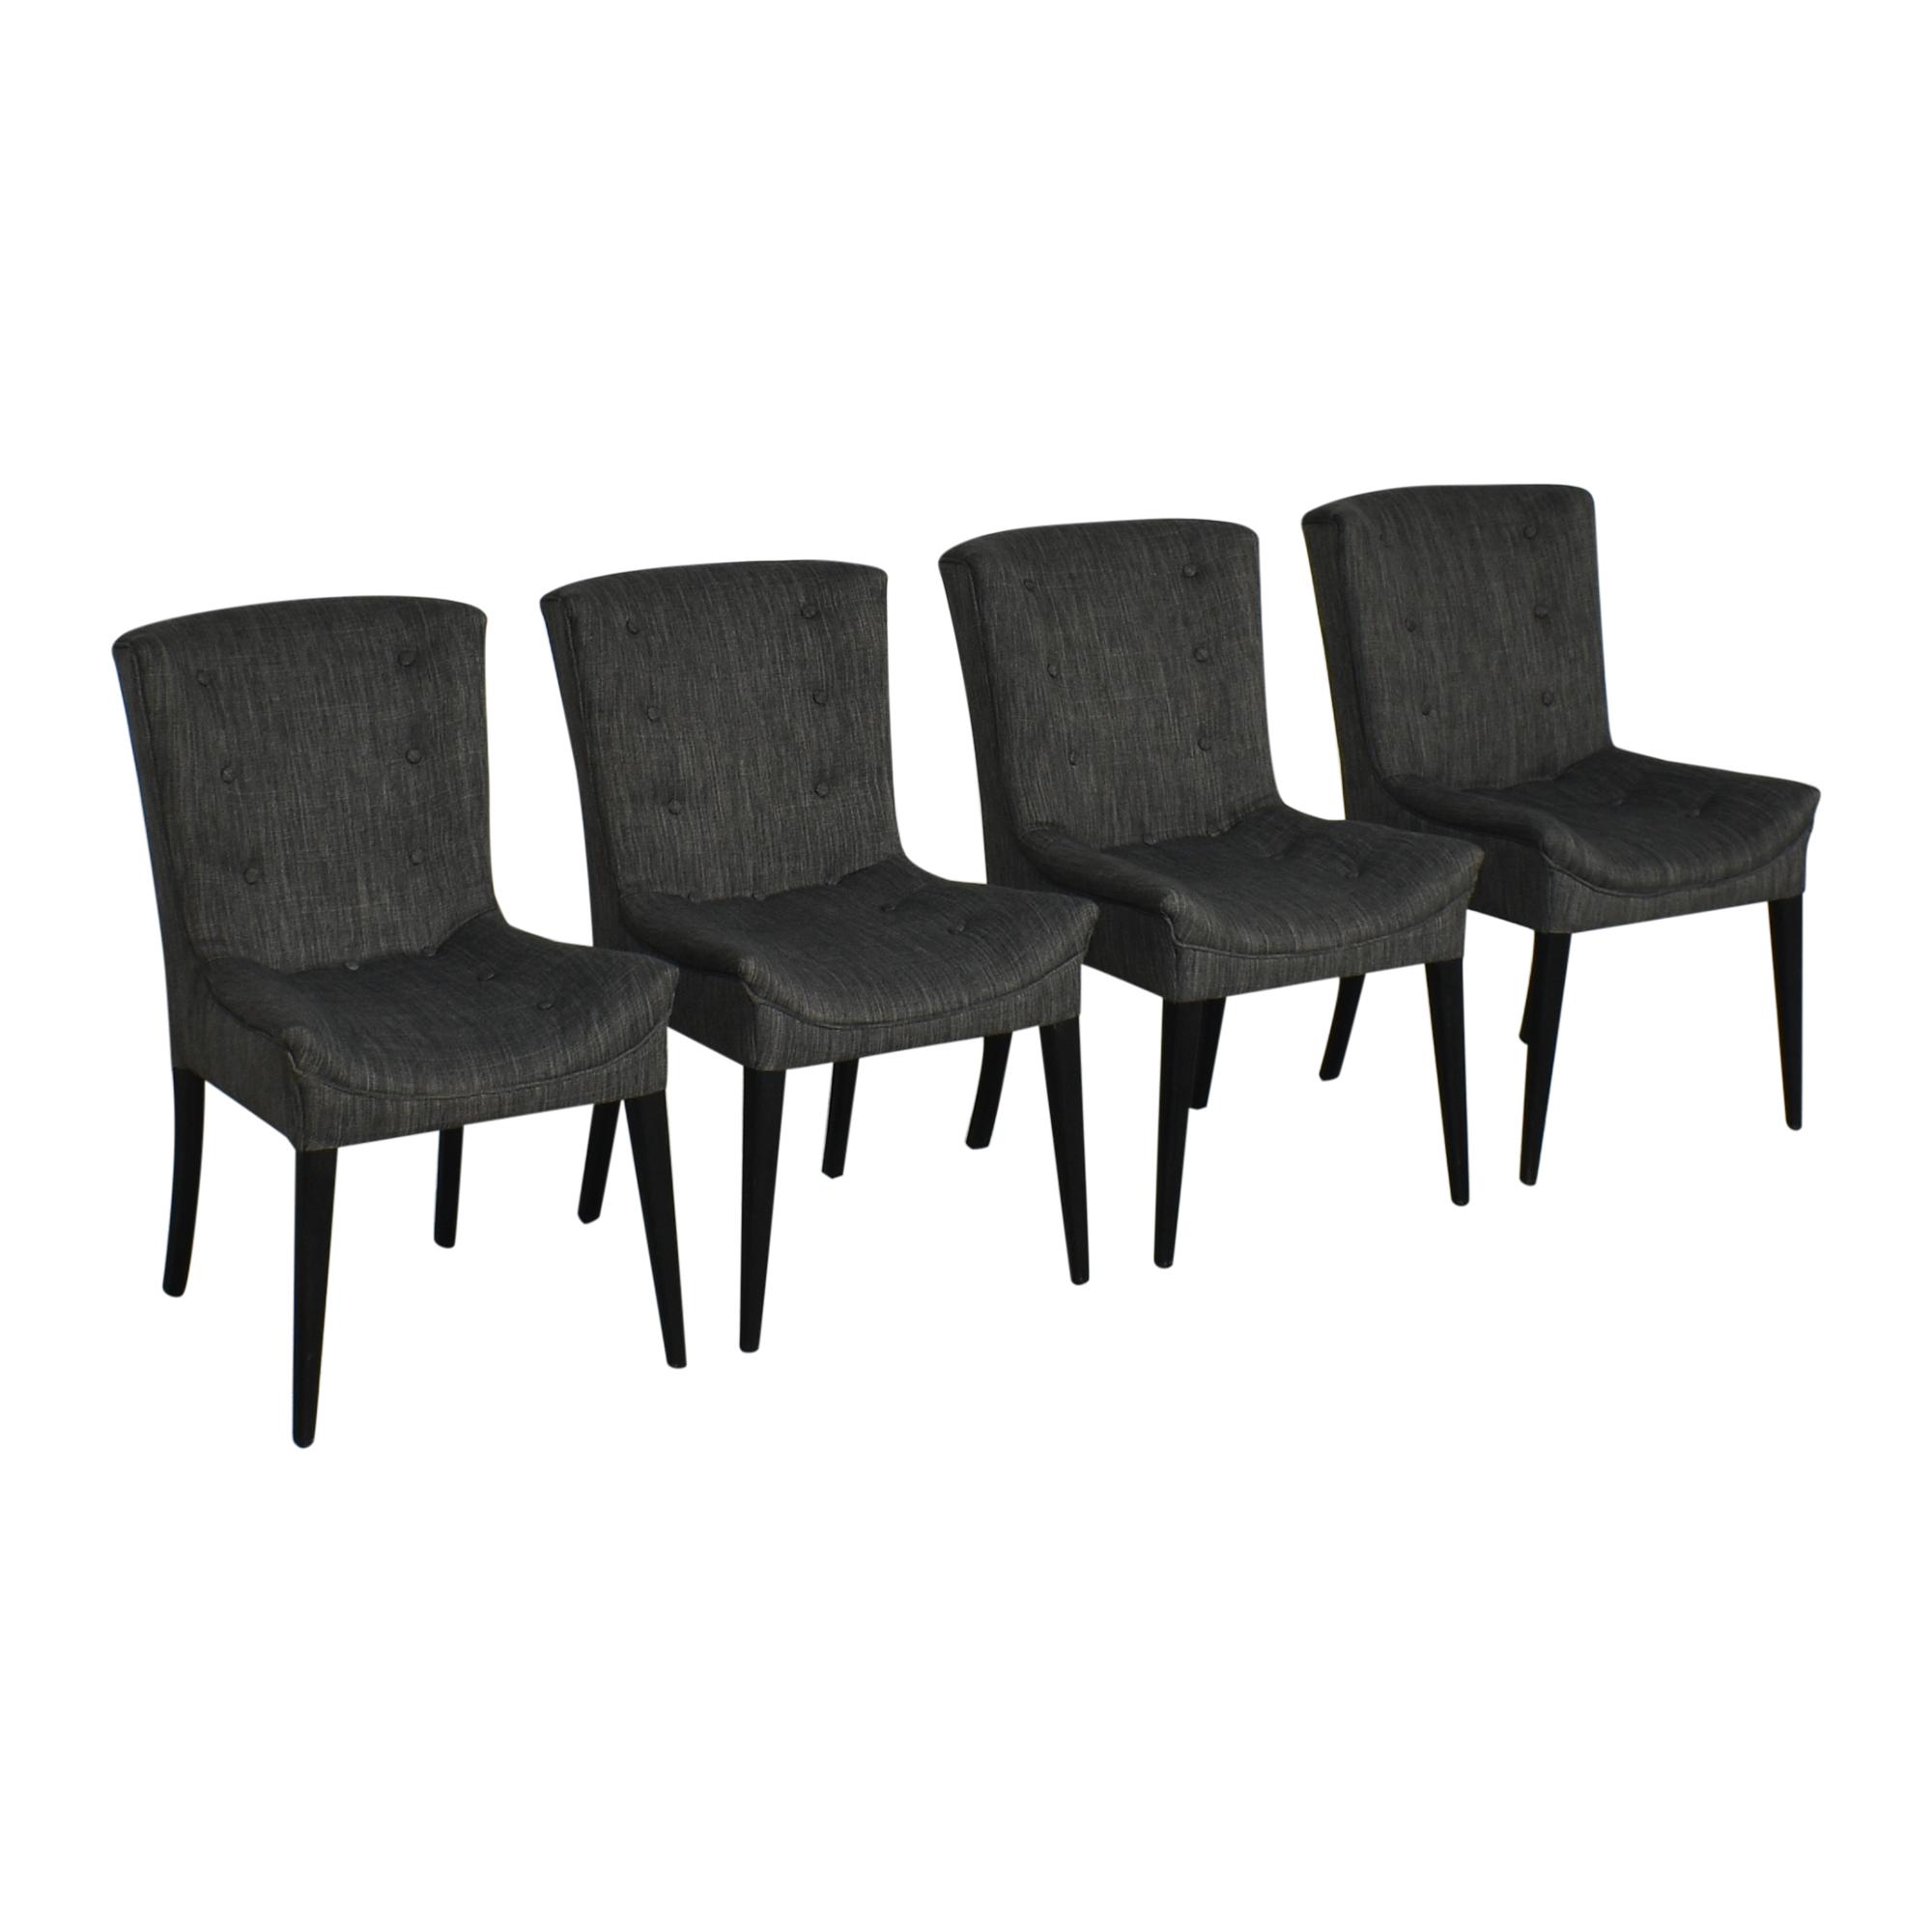 shop Arhaus Grammercy Dining Side Chairs Arhaus Chairs